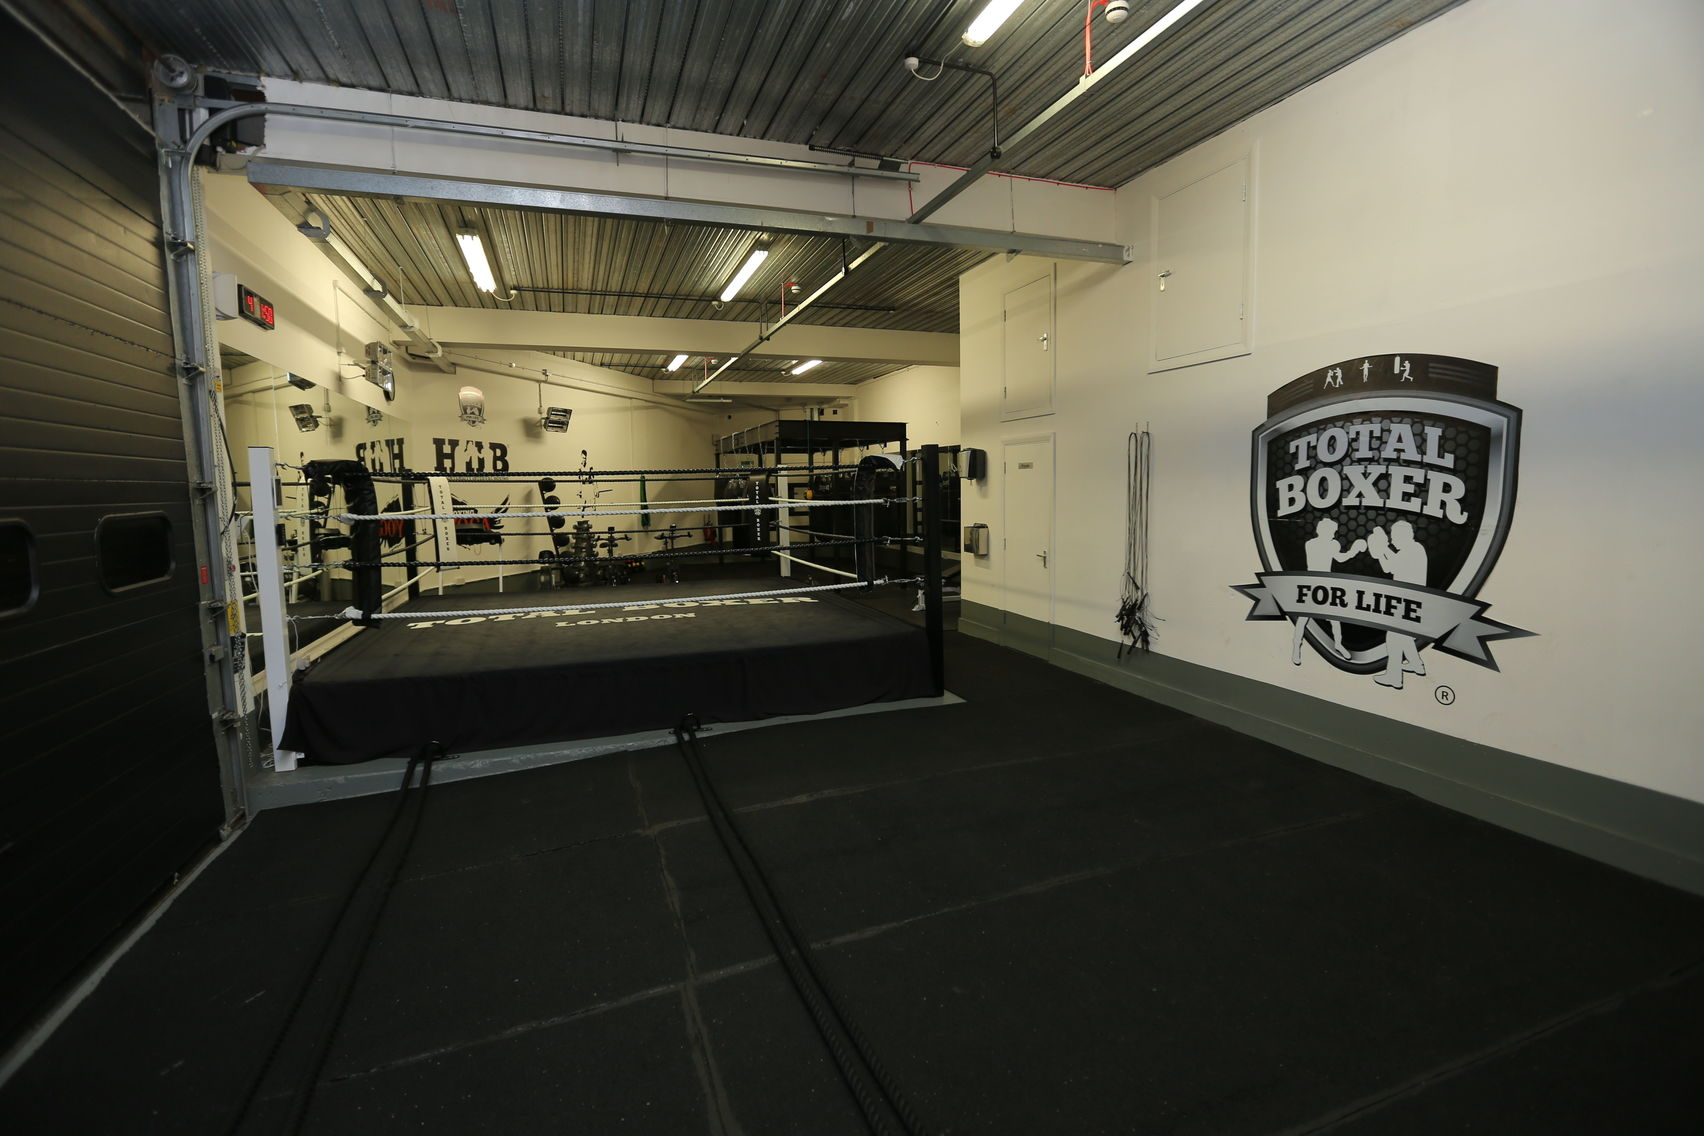 Boxing Gym and Yoga Studio, Total Boxer